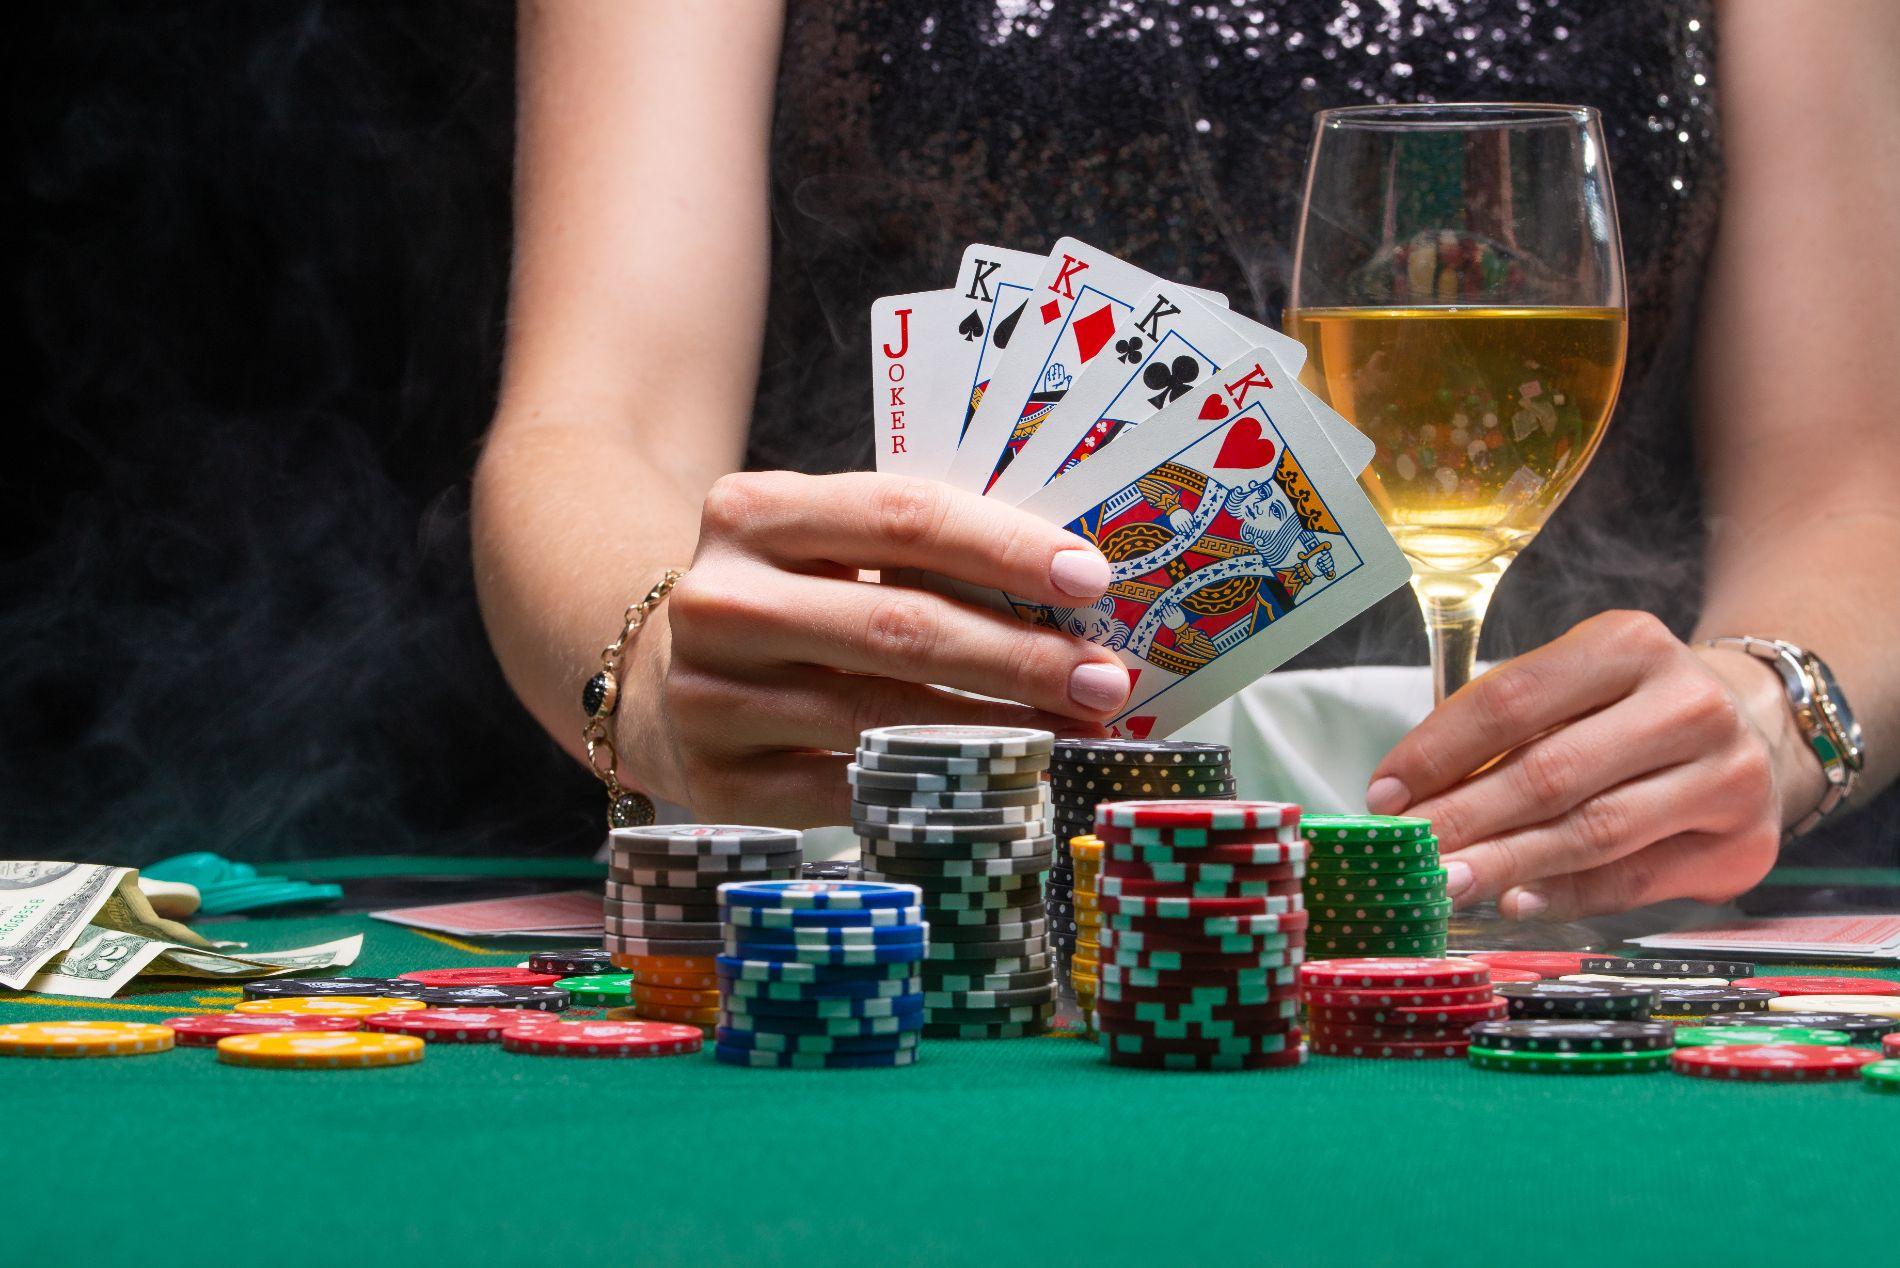 How to Choose Gambling Slot Machines to Maximize Customer Base?